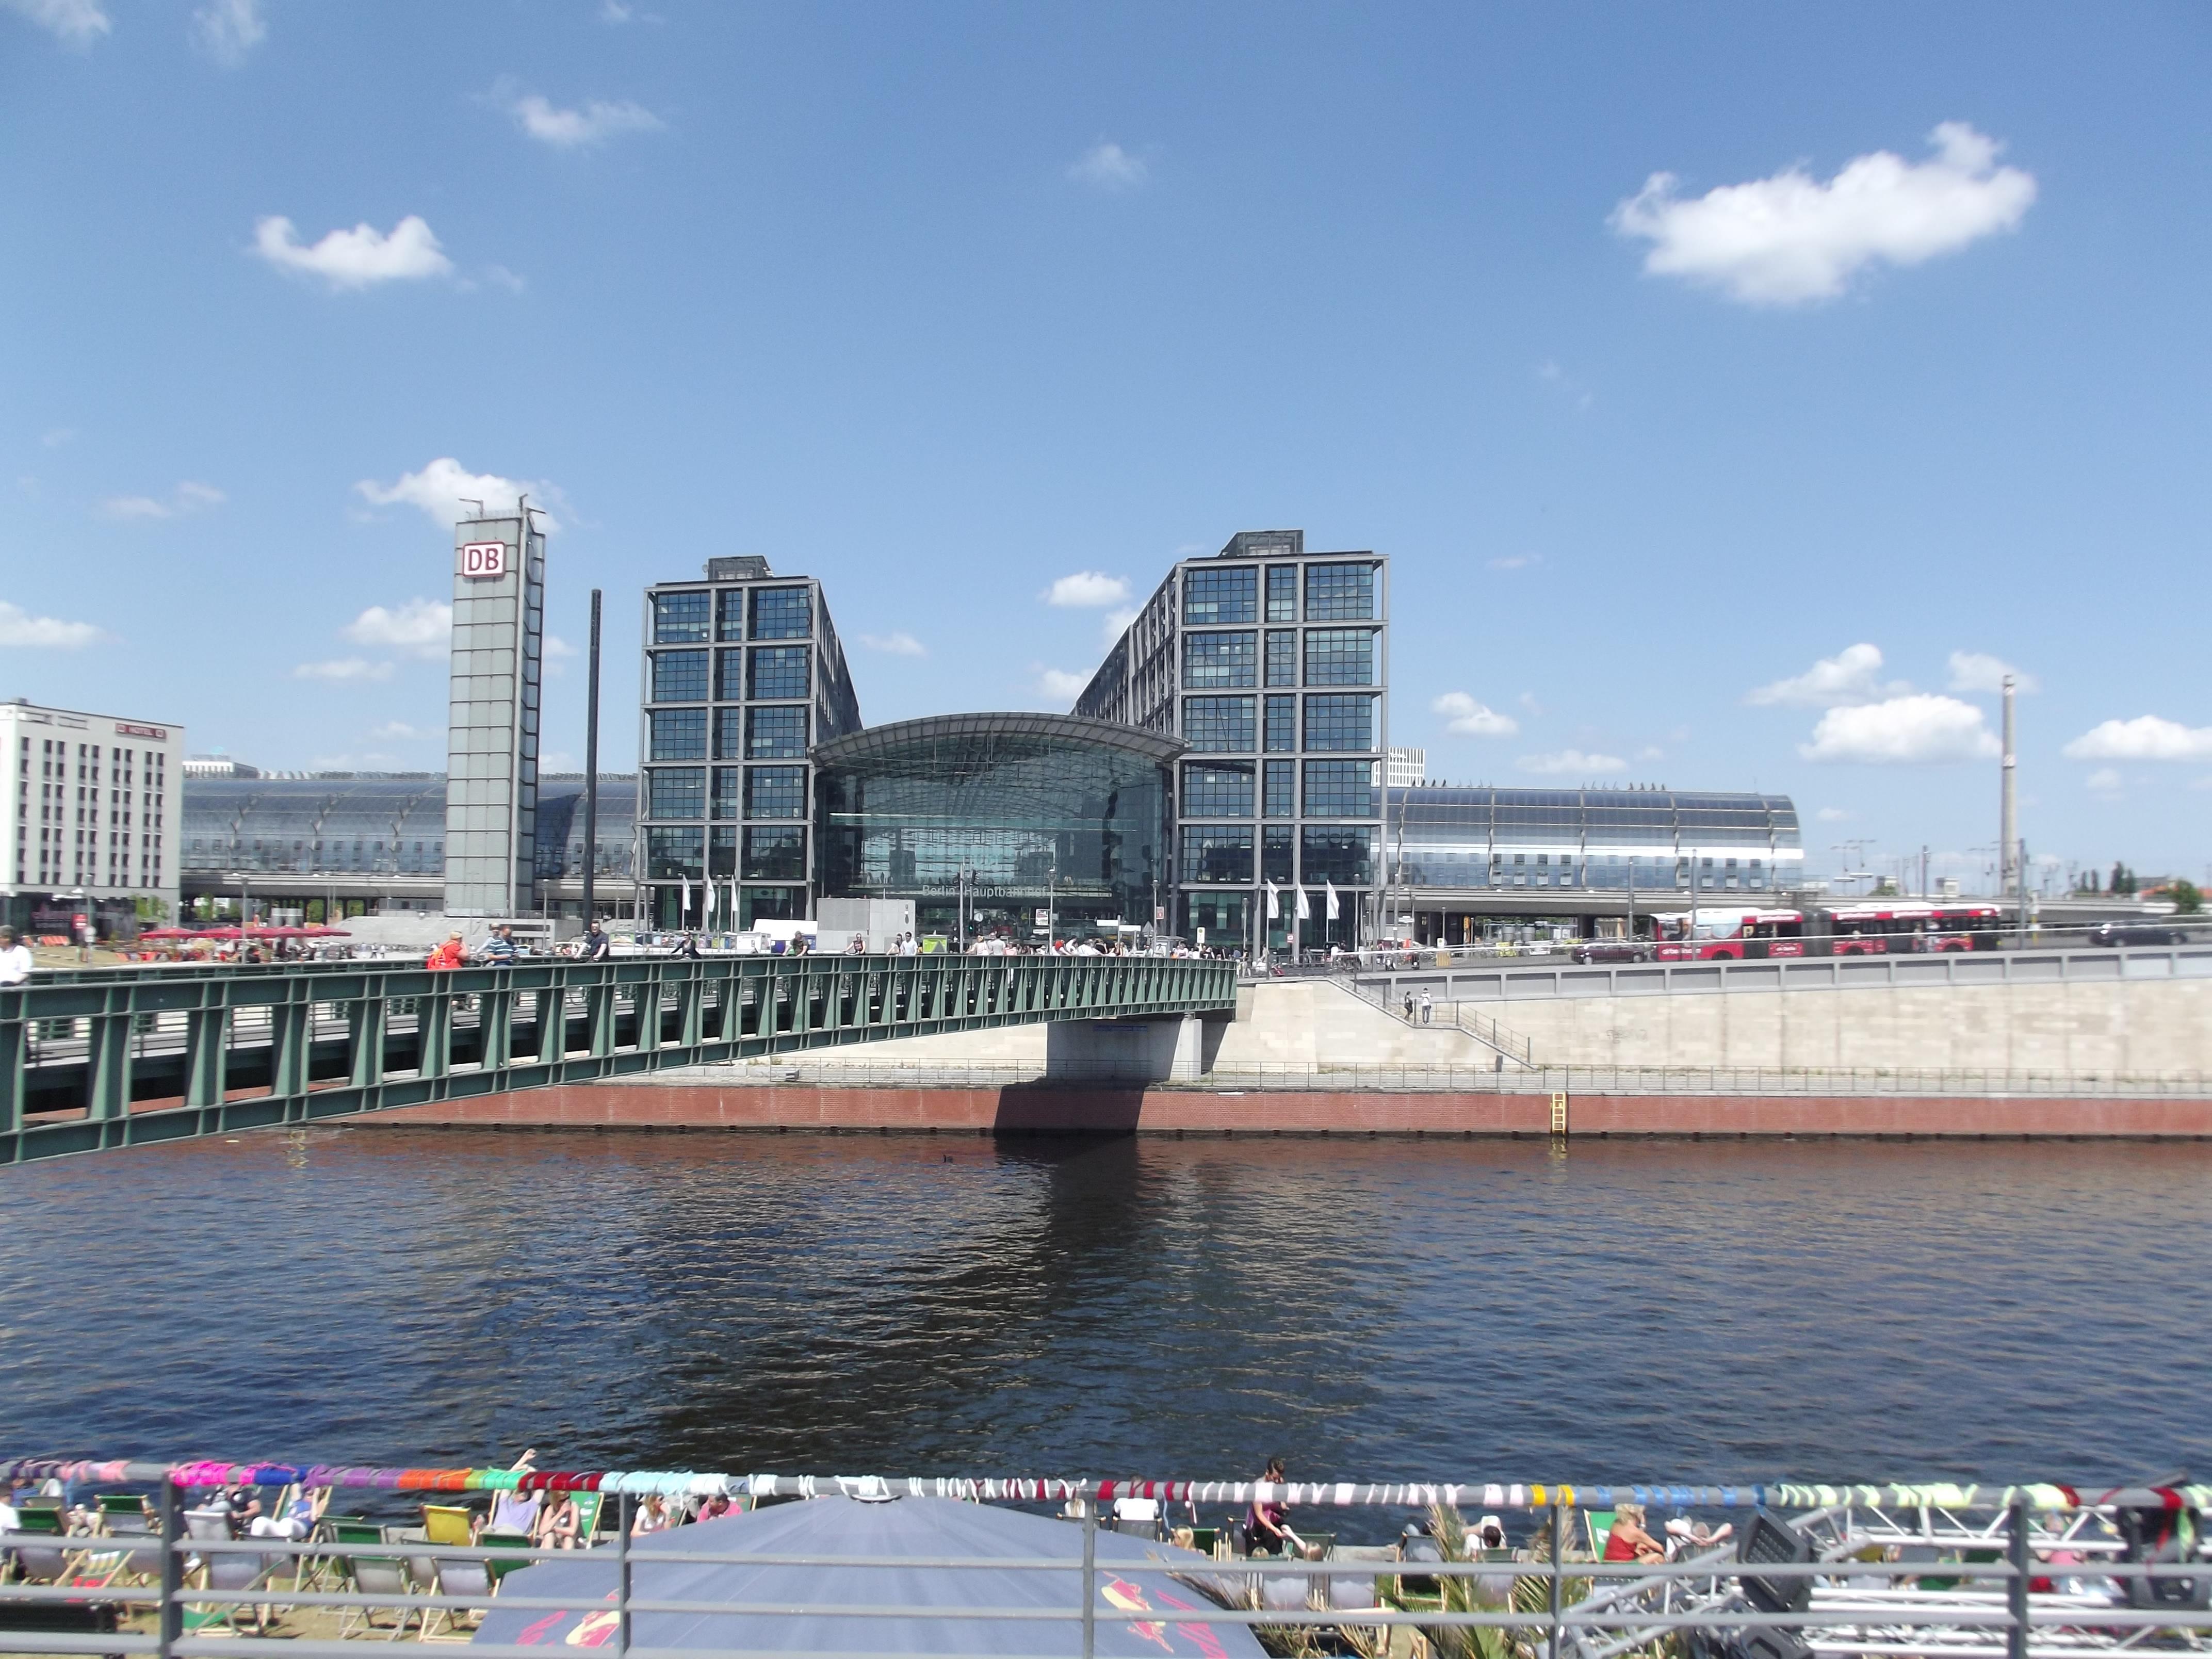 berlin hauptbahnhof central train station world in motion. Black Bedroom Furniture Sets. Home Design Ideas